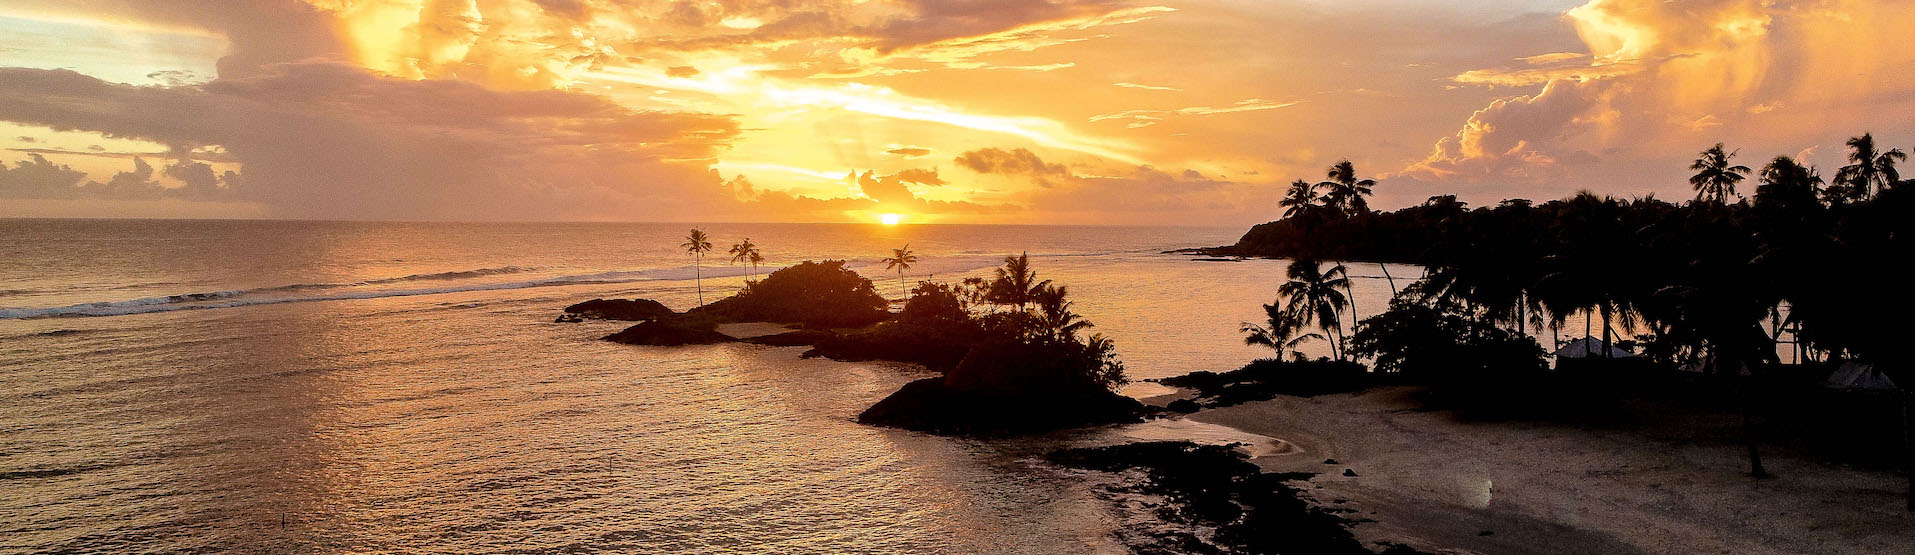 Sonnenuntergang Samoa